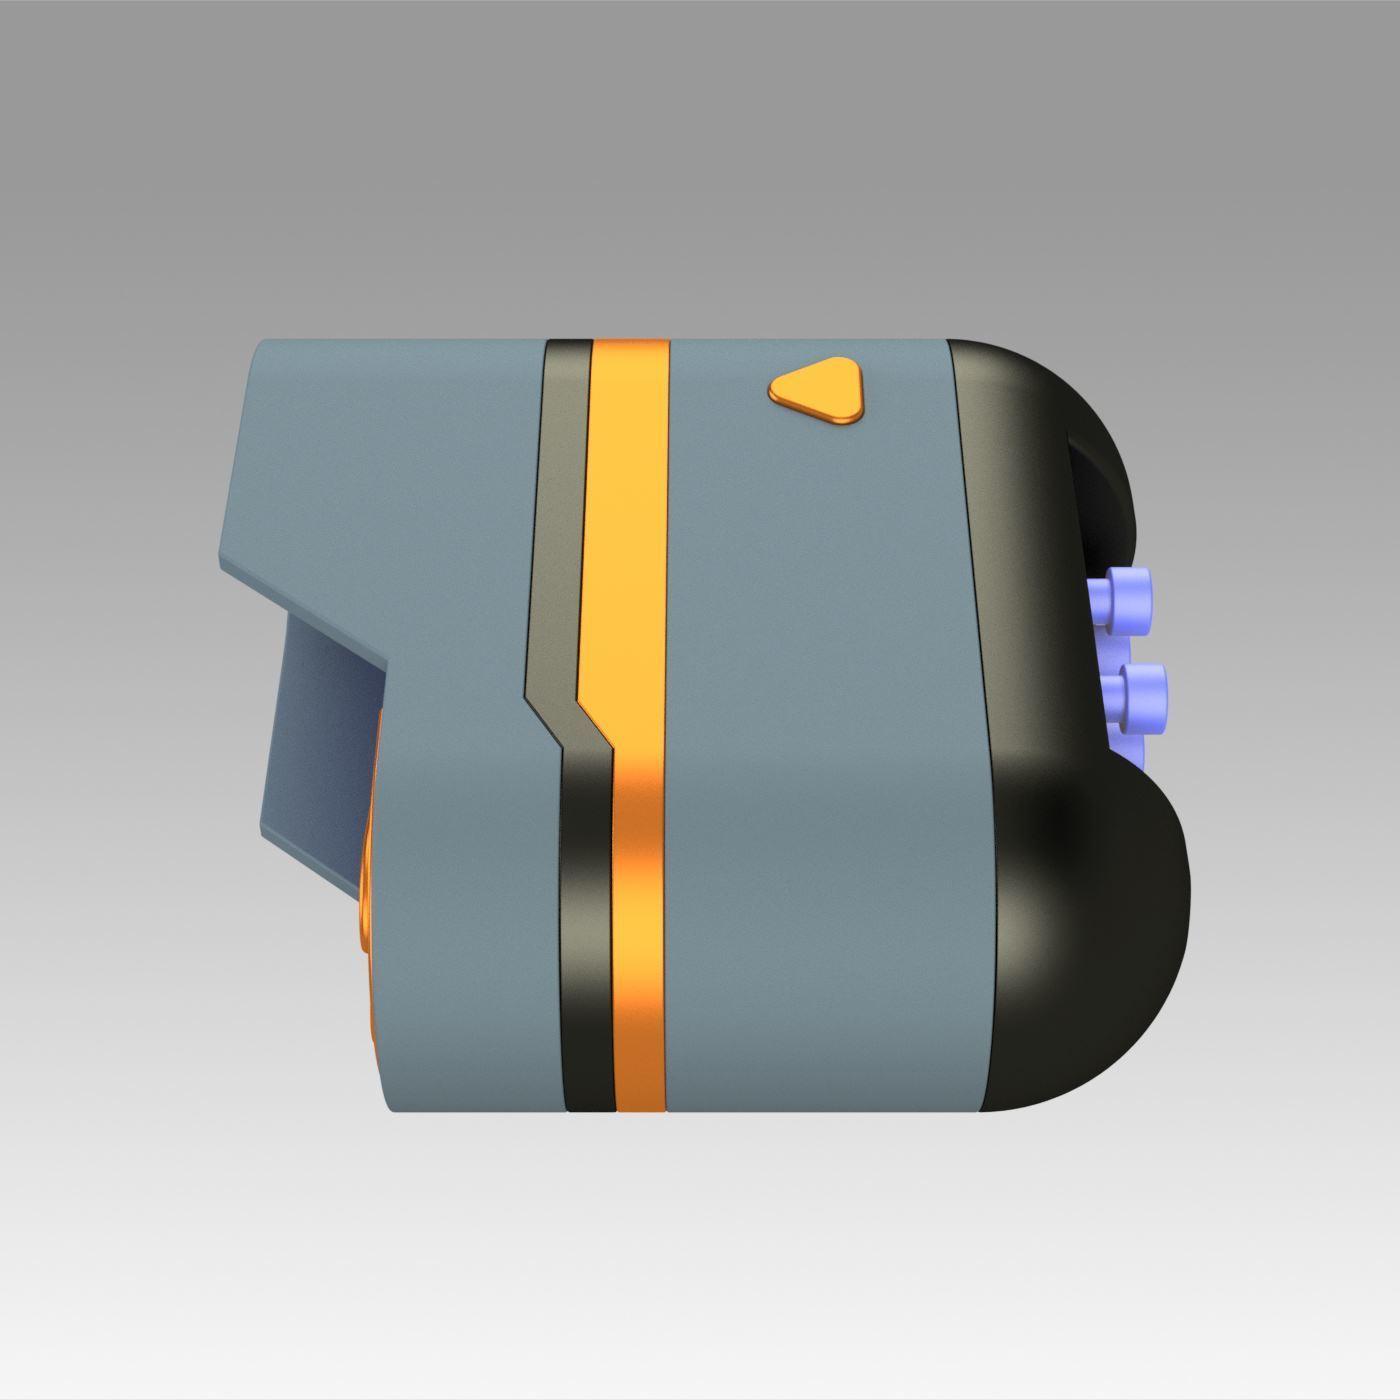 3.jpg Download OBJ file Star Trek Prop Dr Phlox Scanner replica prop cosplay • 3D printer object, Blackeveryday